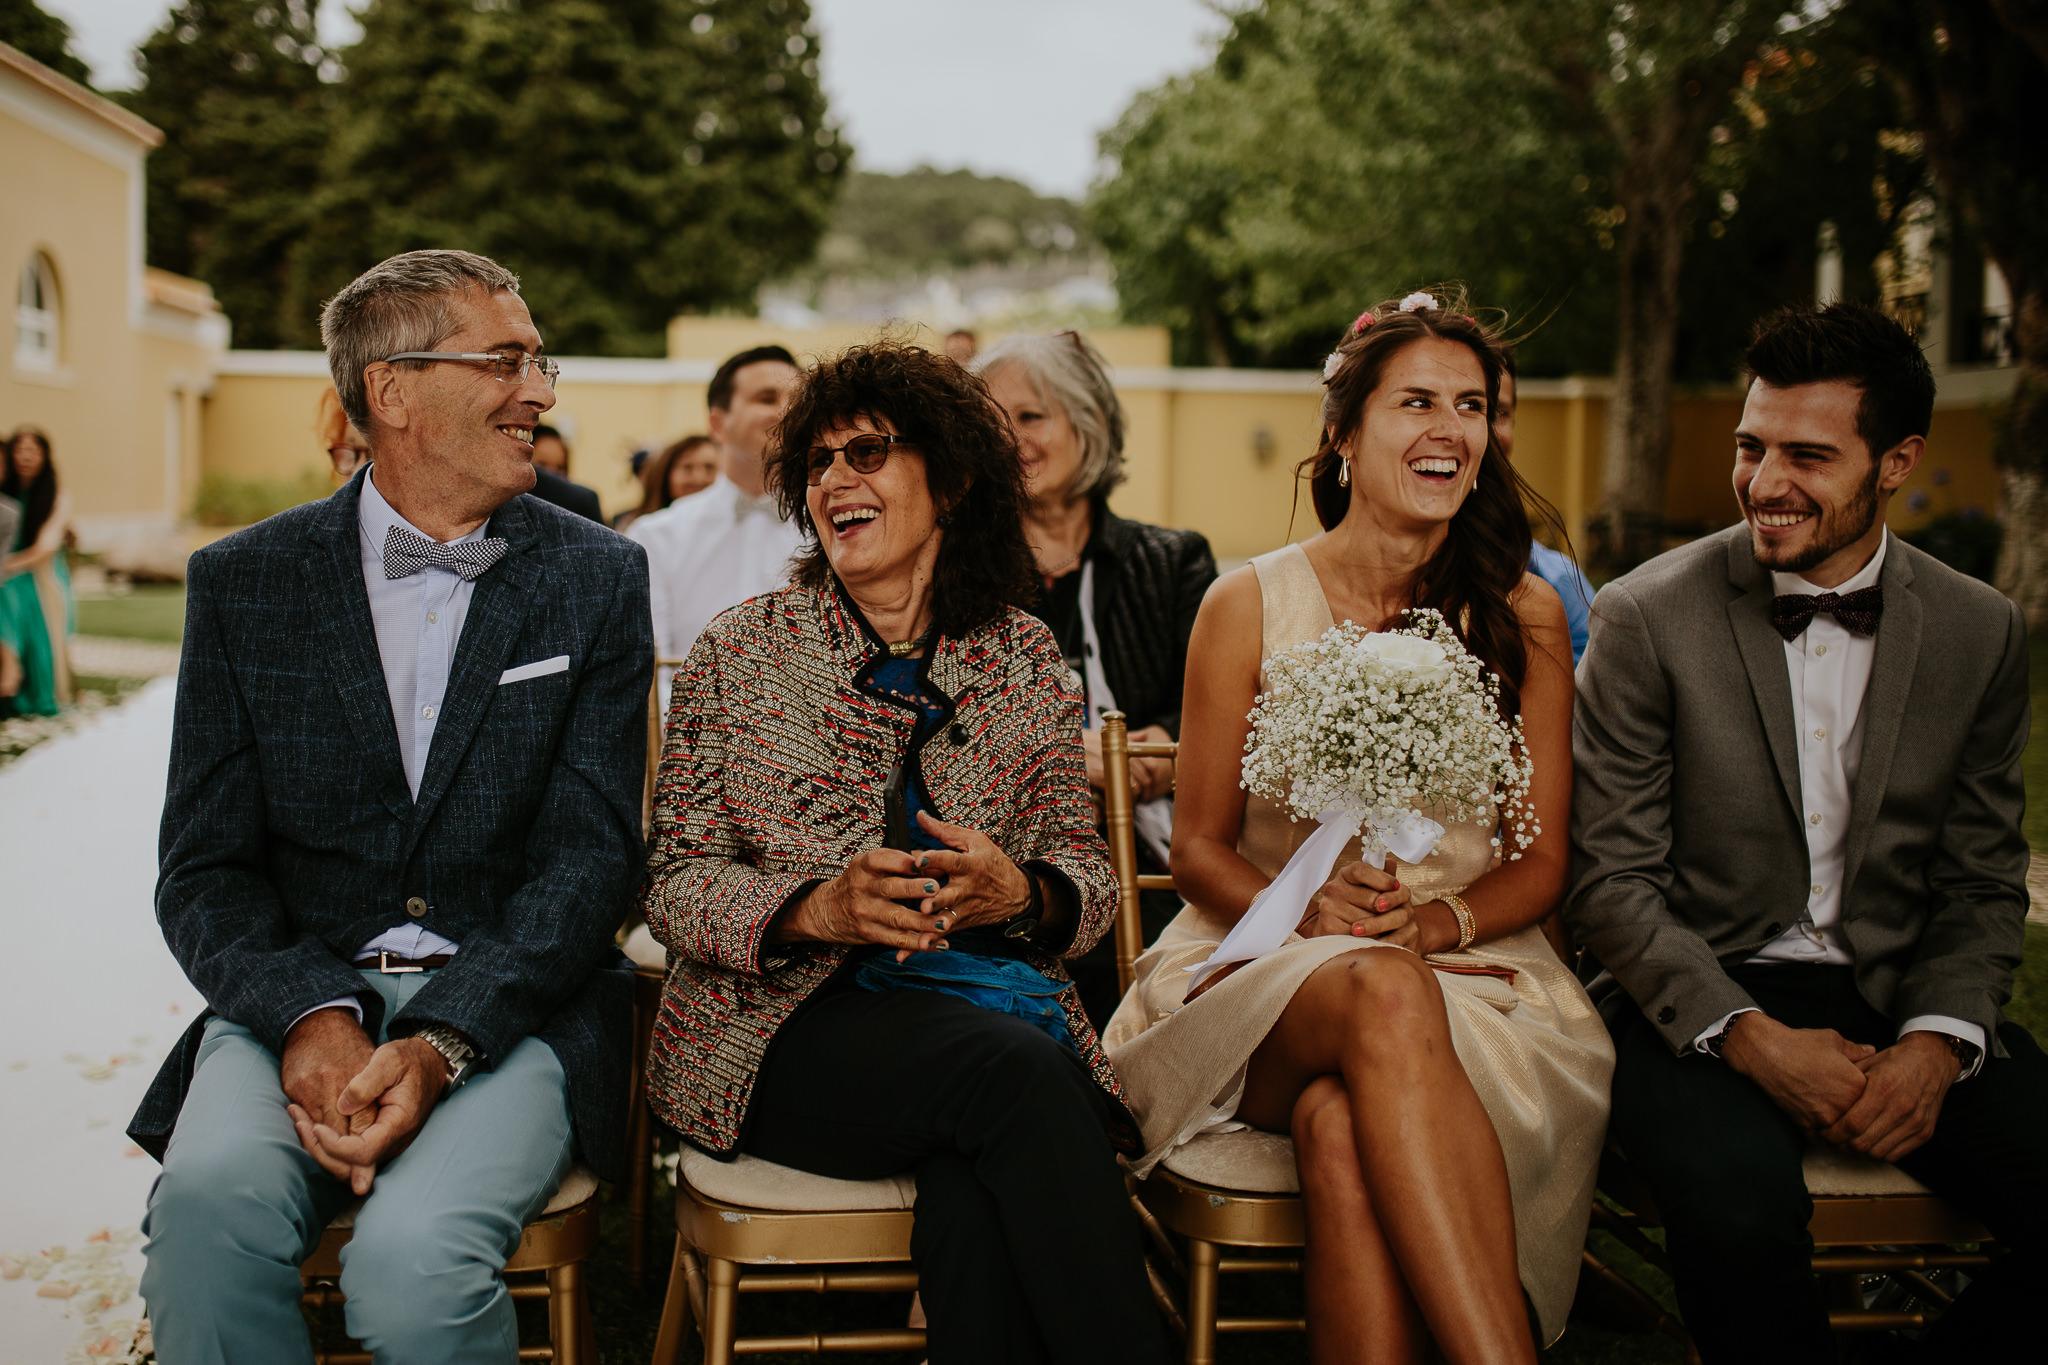 romina_thomas_destination_wedding_photography_fotografia_de_casamento_lisbon_sintra_penha_longa_resort-20